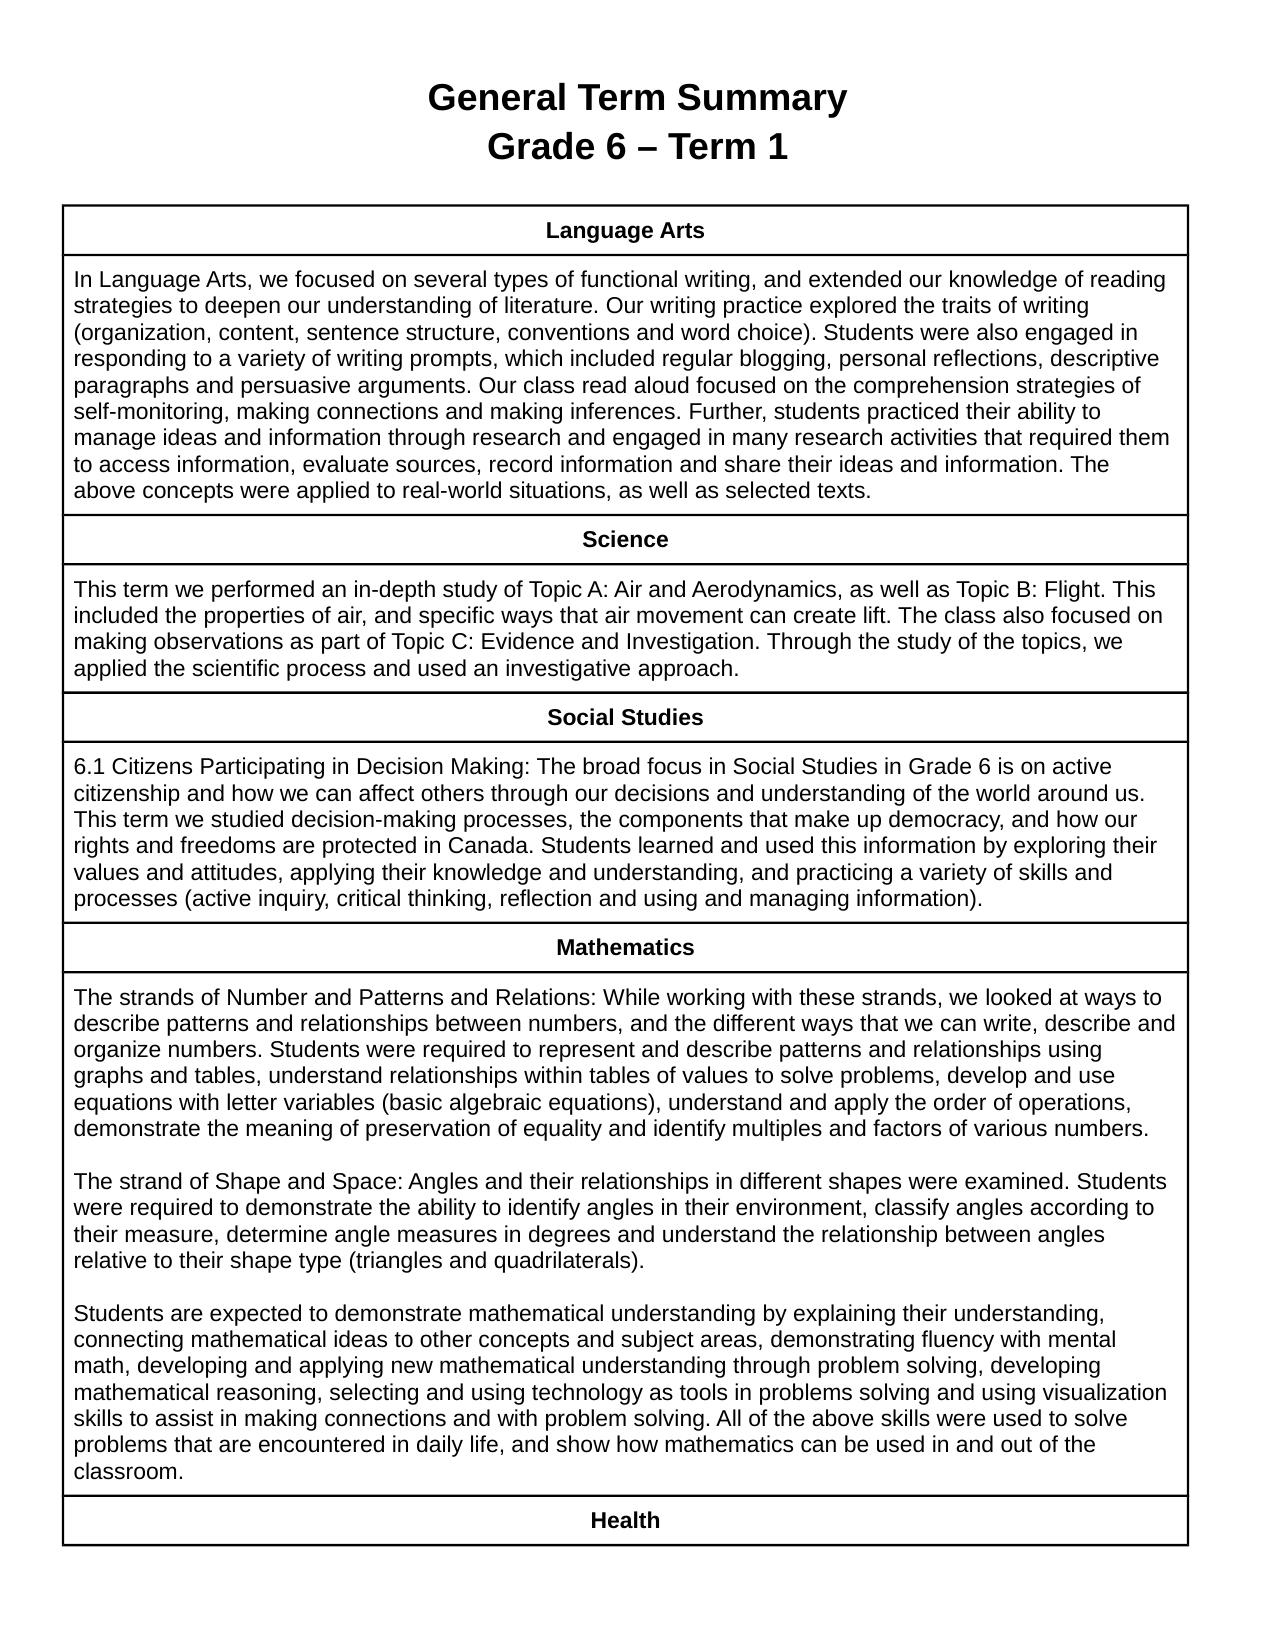 Pinruhi Khan On Report Com | Report Card Comments, Report - Free Printable Report Card Comments